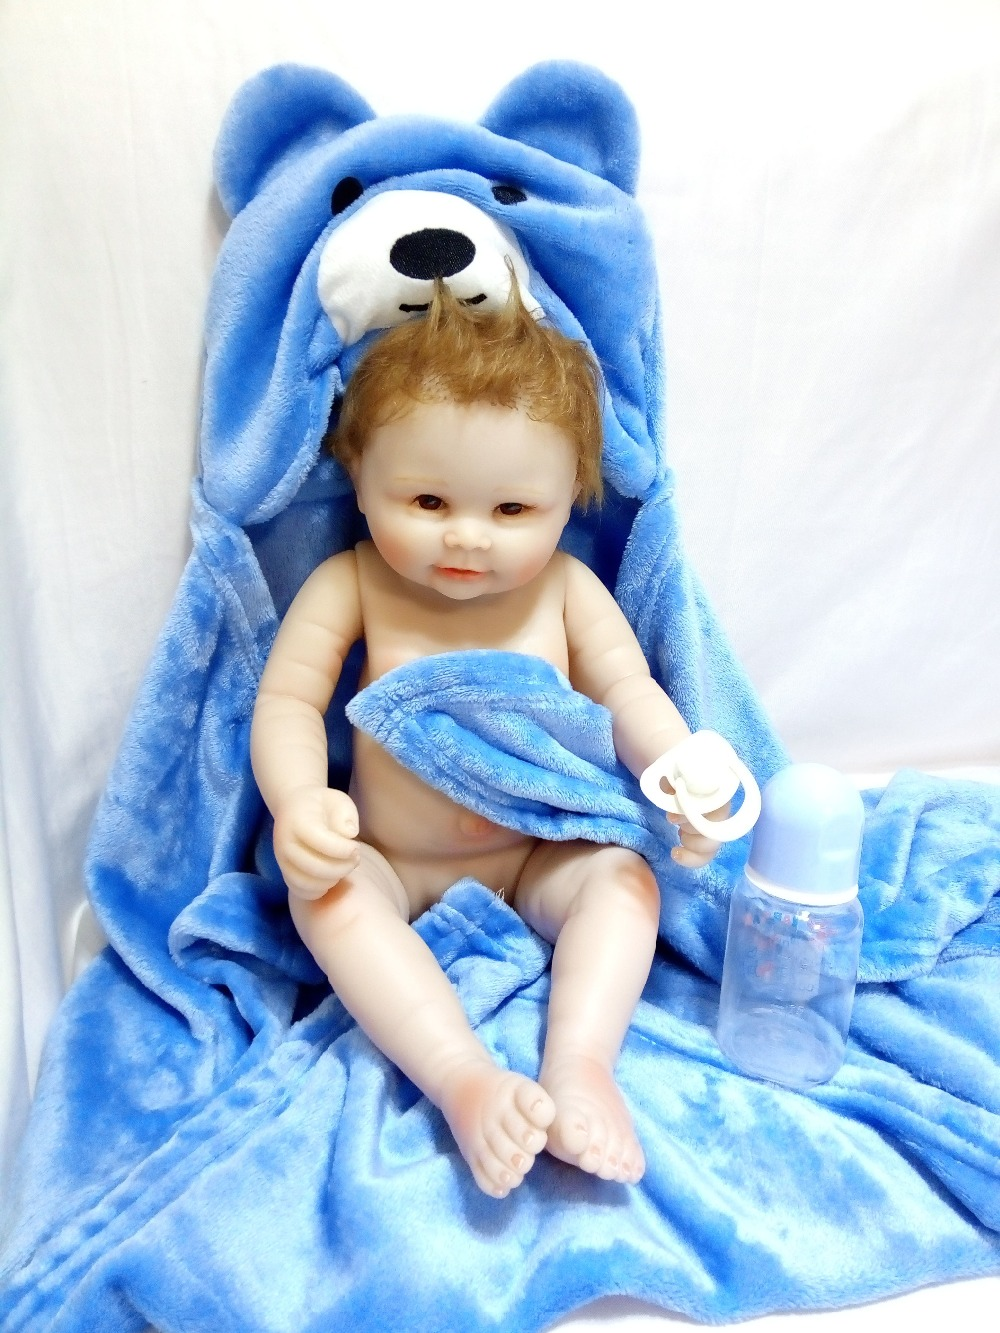 20 Inch Full Vinyl Dolls For Girls Toys Silicone Reborn Baby Boy Doll 50 CM Tiger Toy Girl Children's Birthday Gifts For Mom